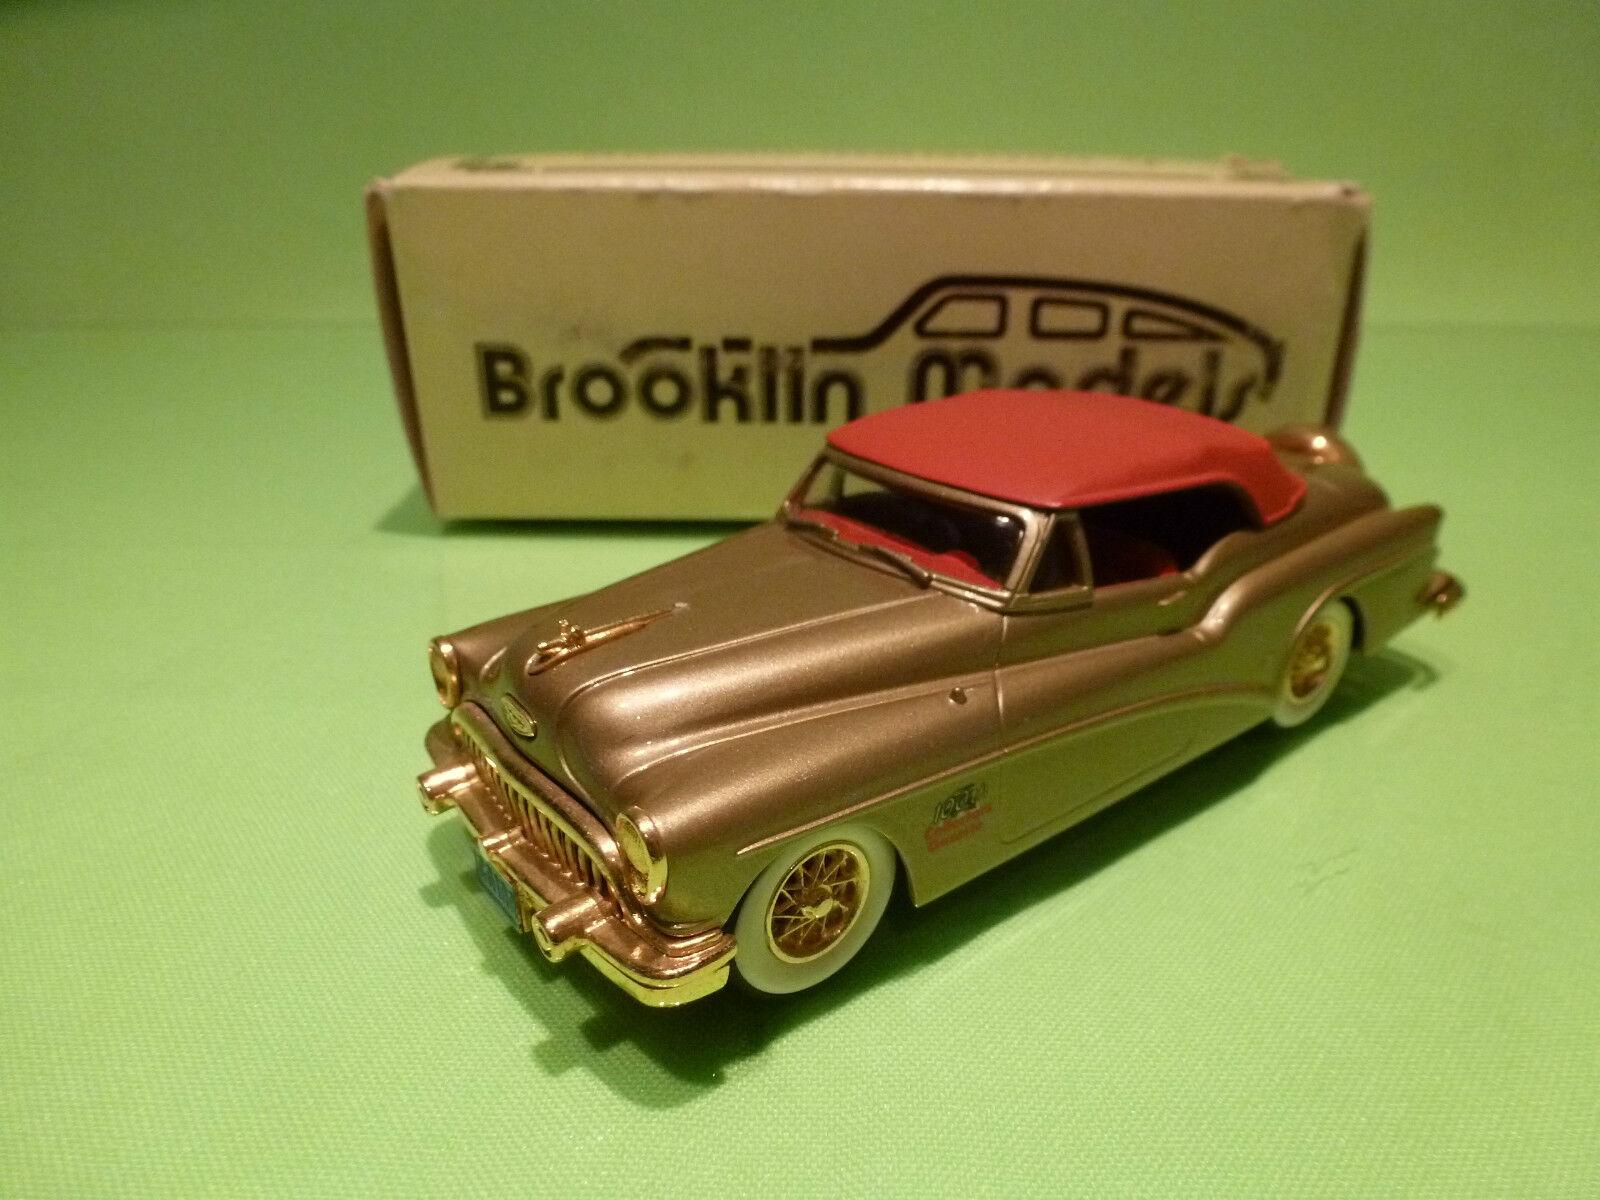 BROOKLIN MODELS BRK 20x BUICK SKYLARK CONverdeIBLE 1953 - GAZETTE - 1 43 - NMIB